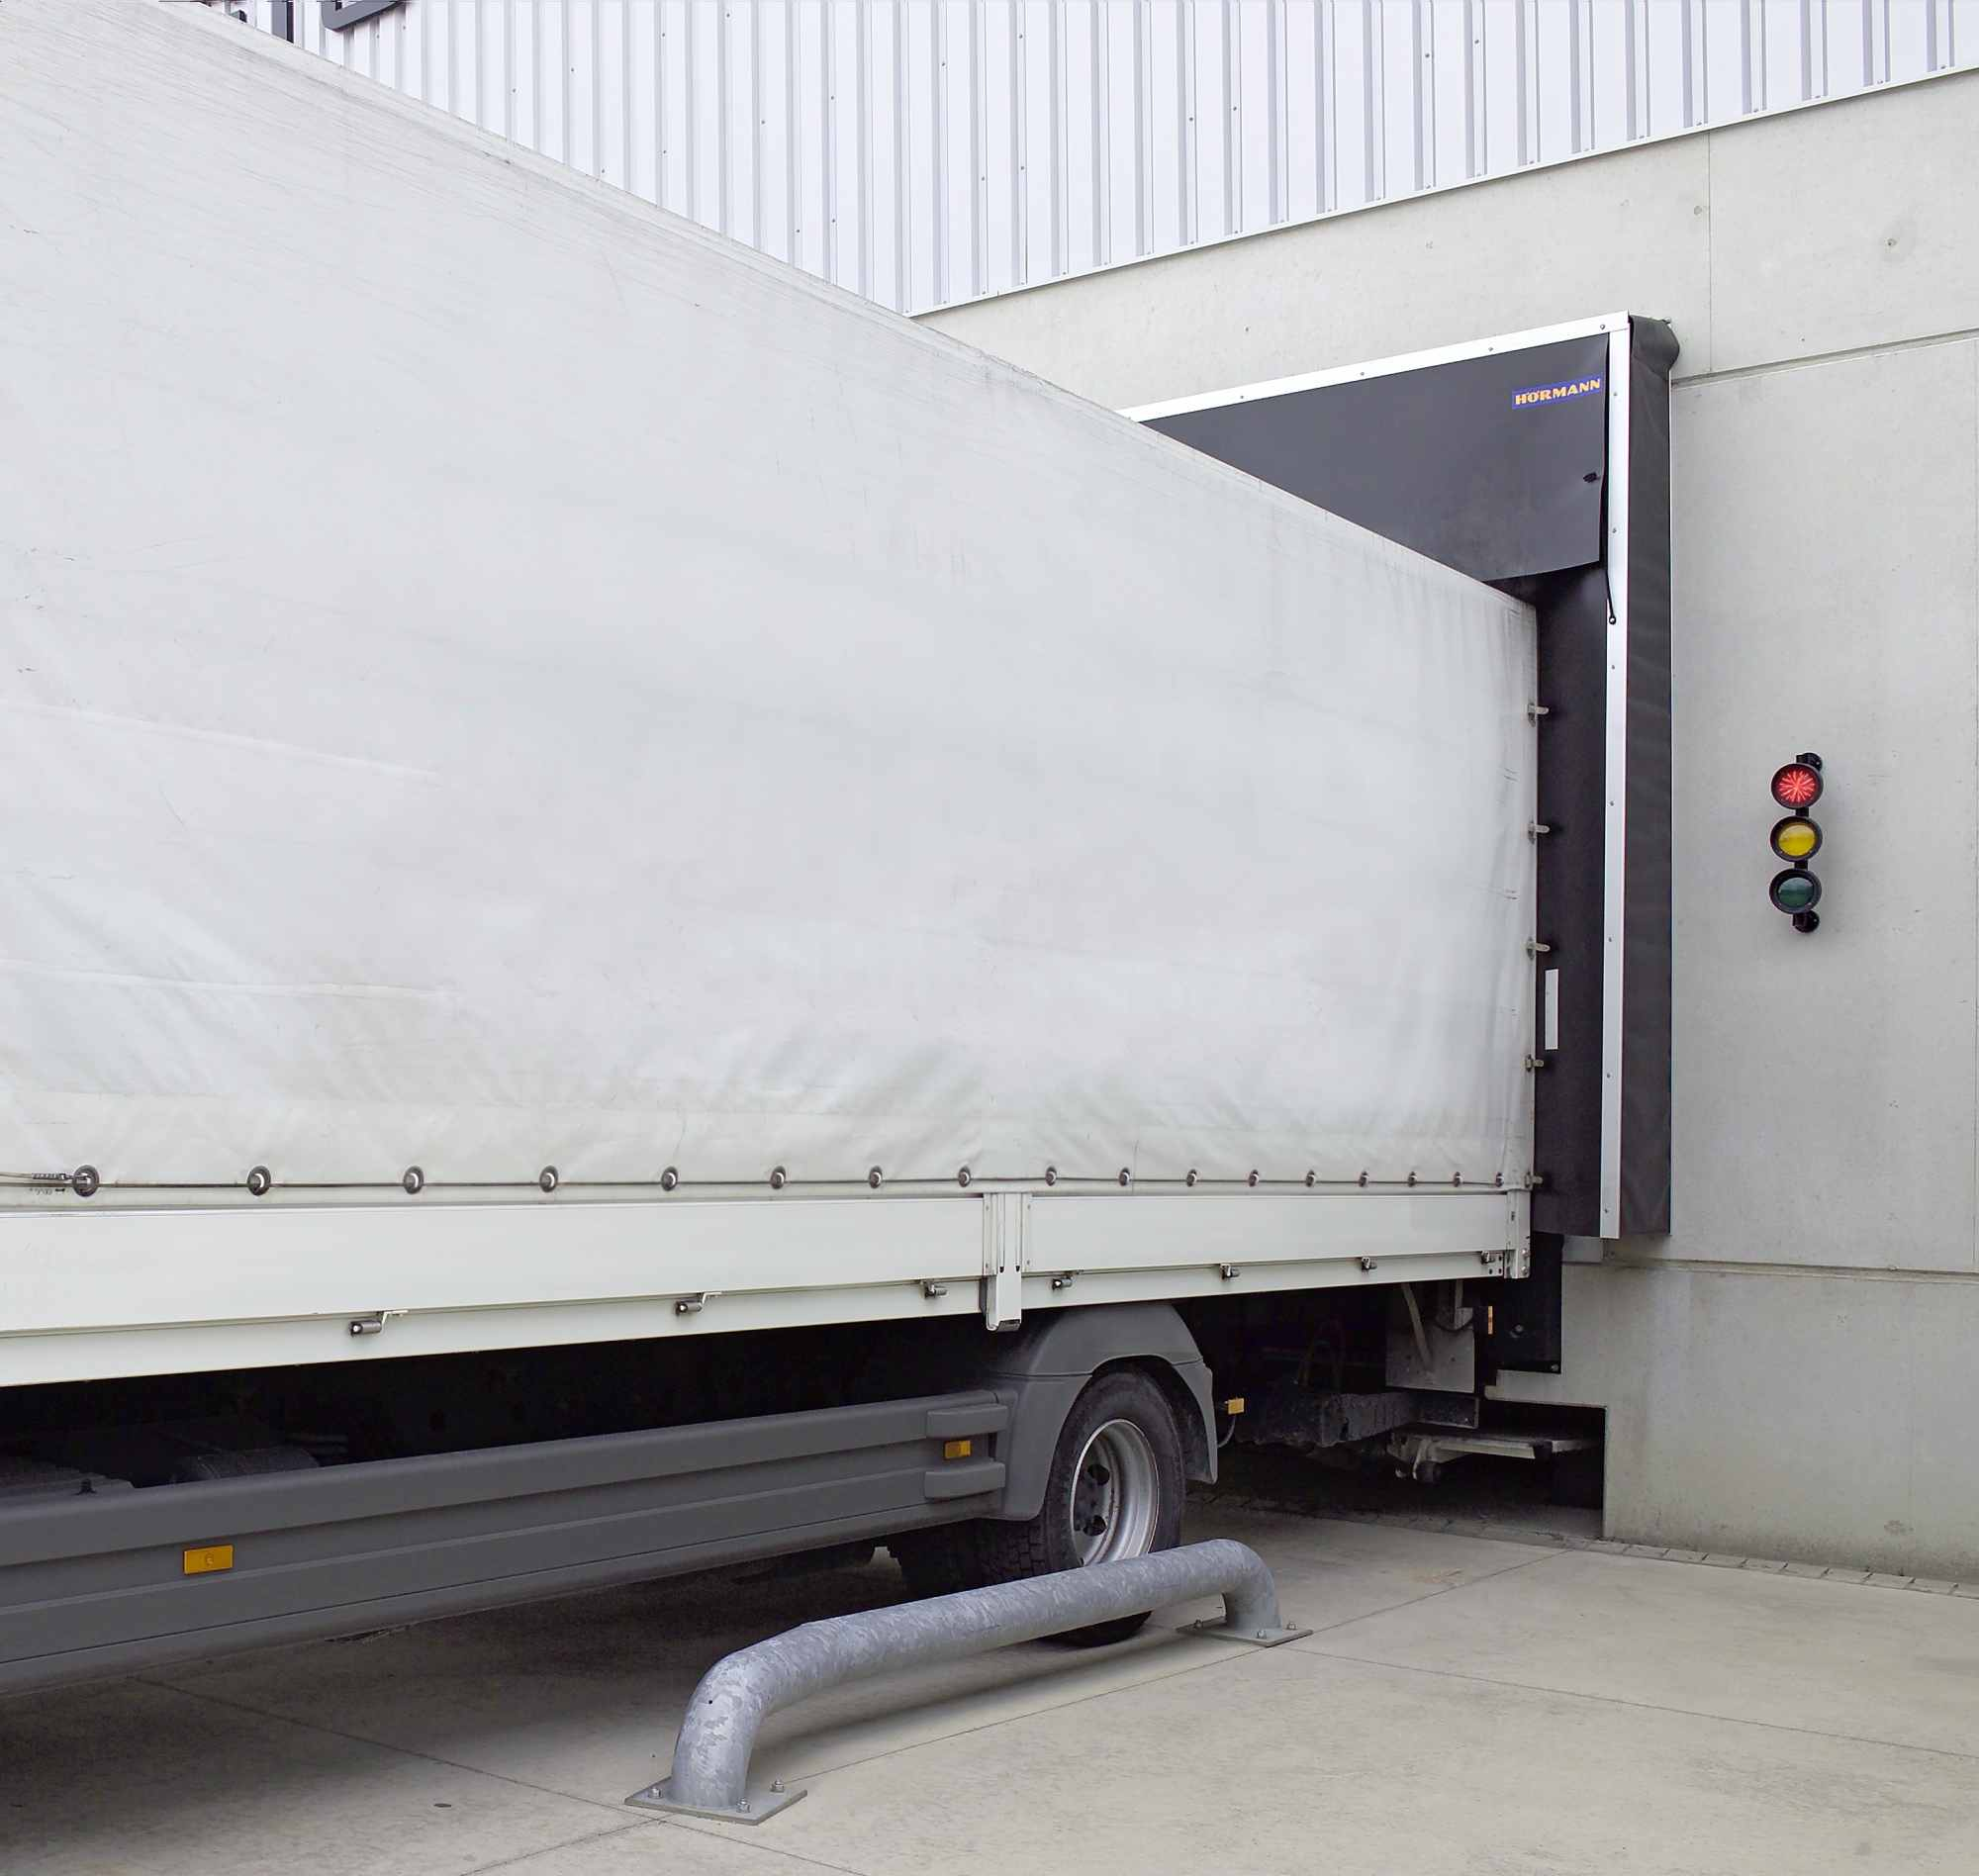 Sistema Dock Control Hoermann regola e salvaguarda processi carico e scarico